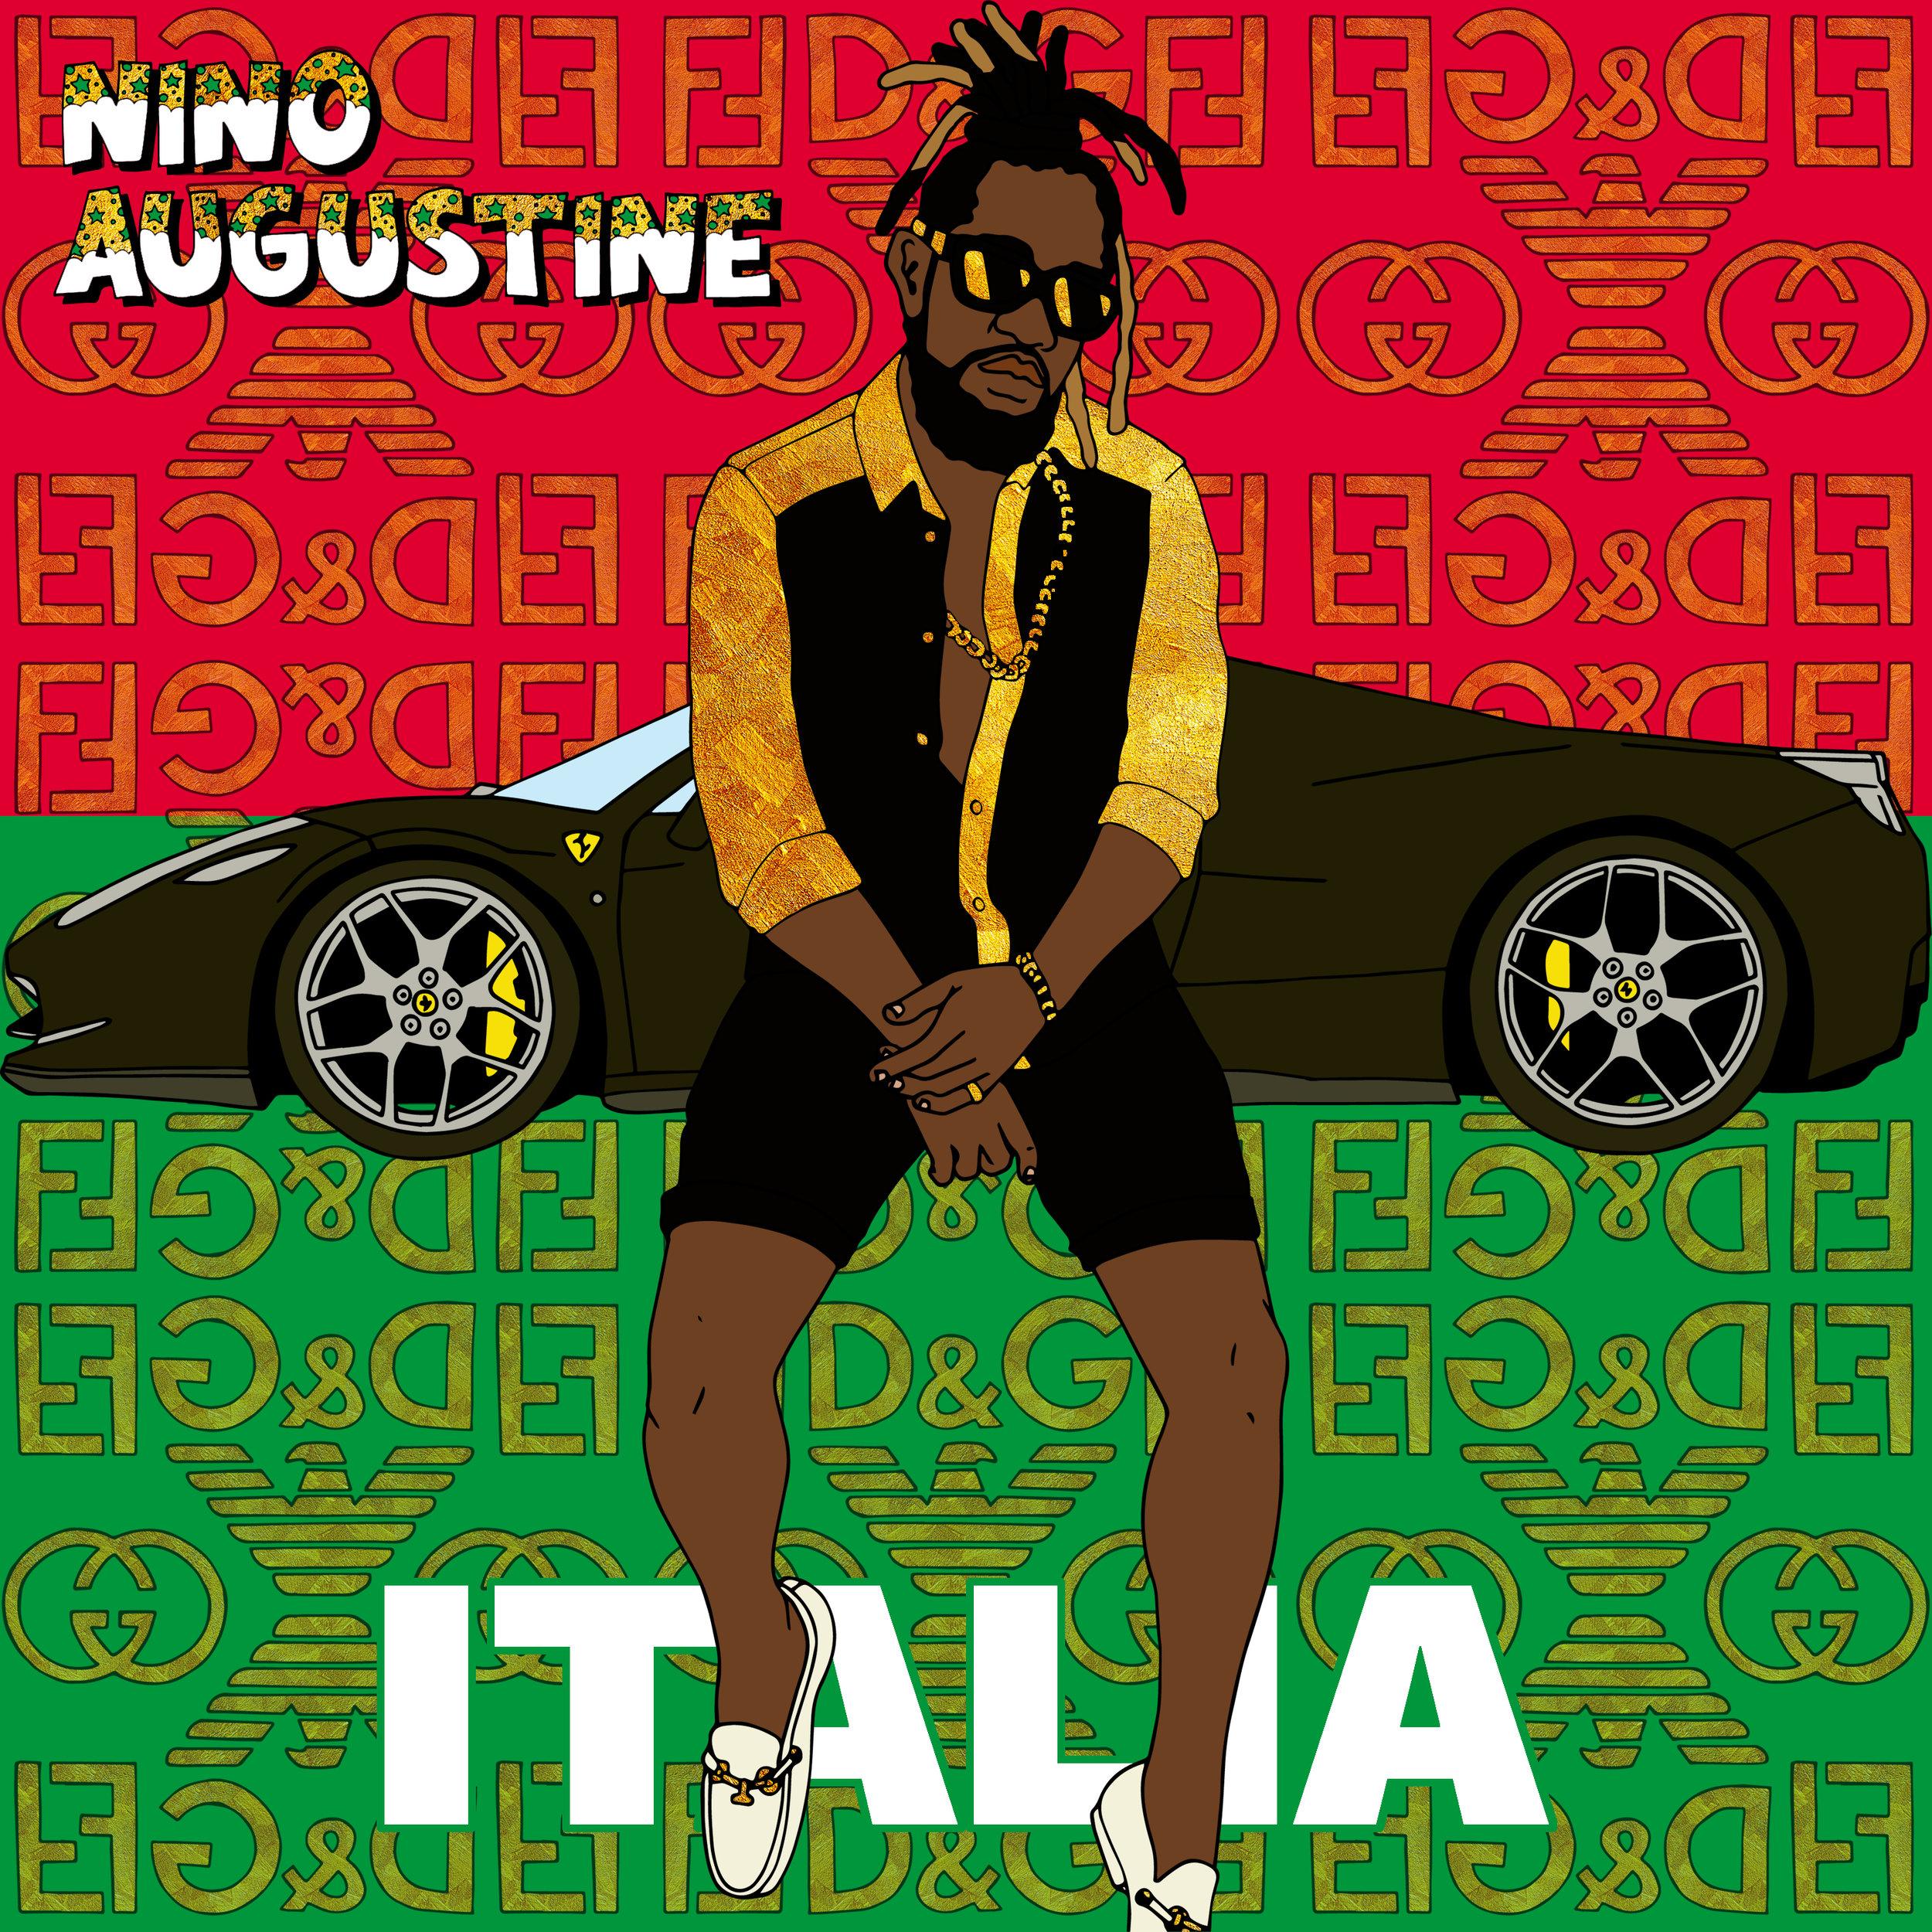 Nino Augustine - Italia (single)